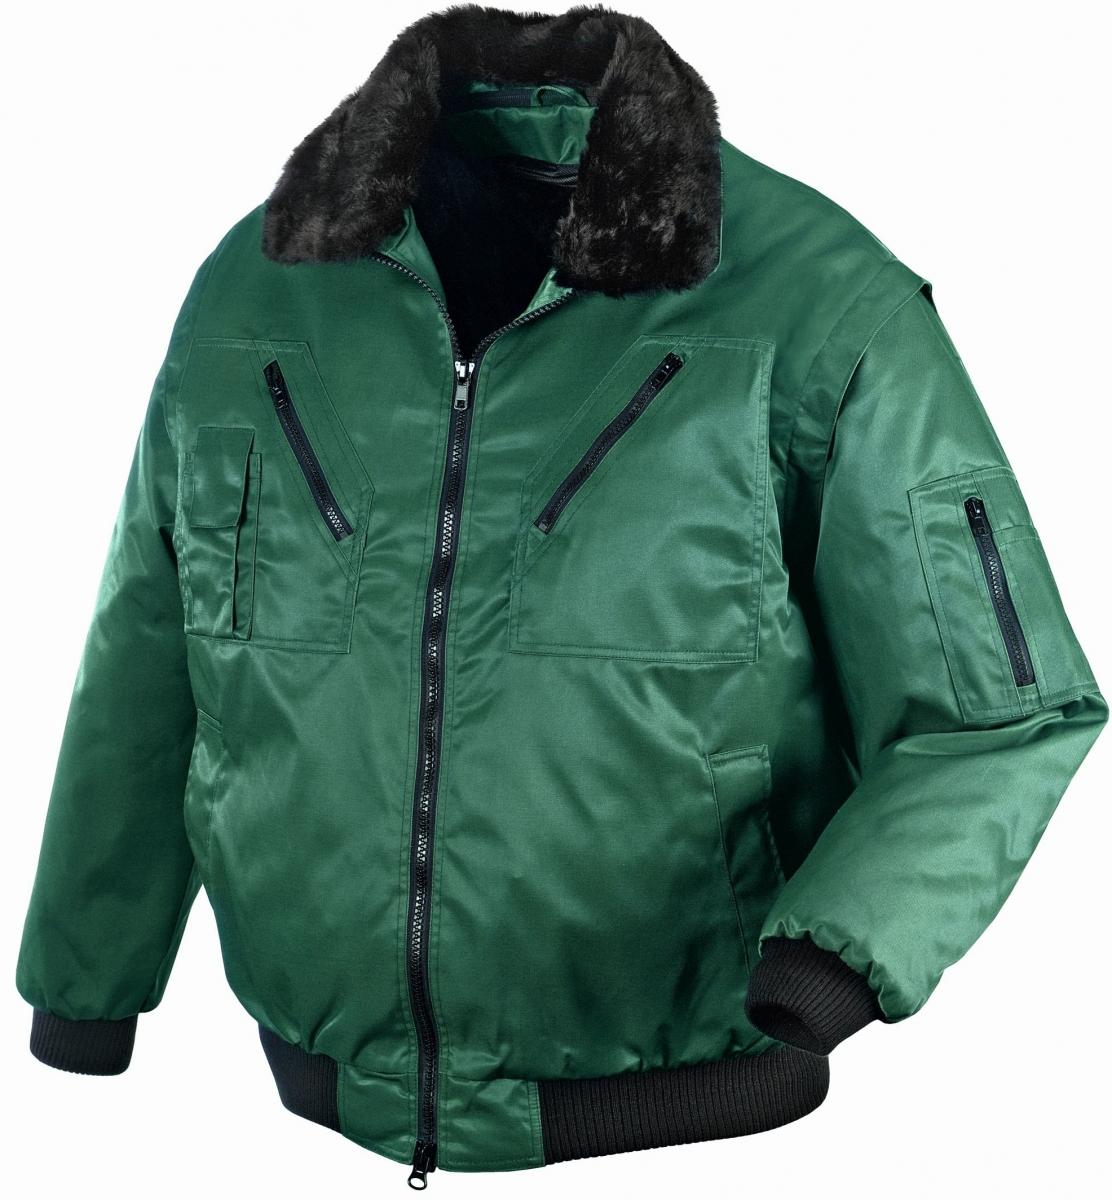 BIG-TEXXOR-Kälte-Schutz, Winter-Arbeits-Berufs-Piloten-Jacke, Oslo, grün